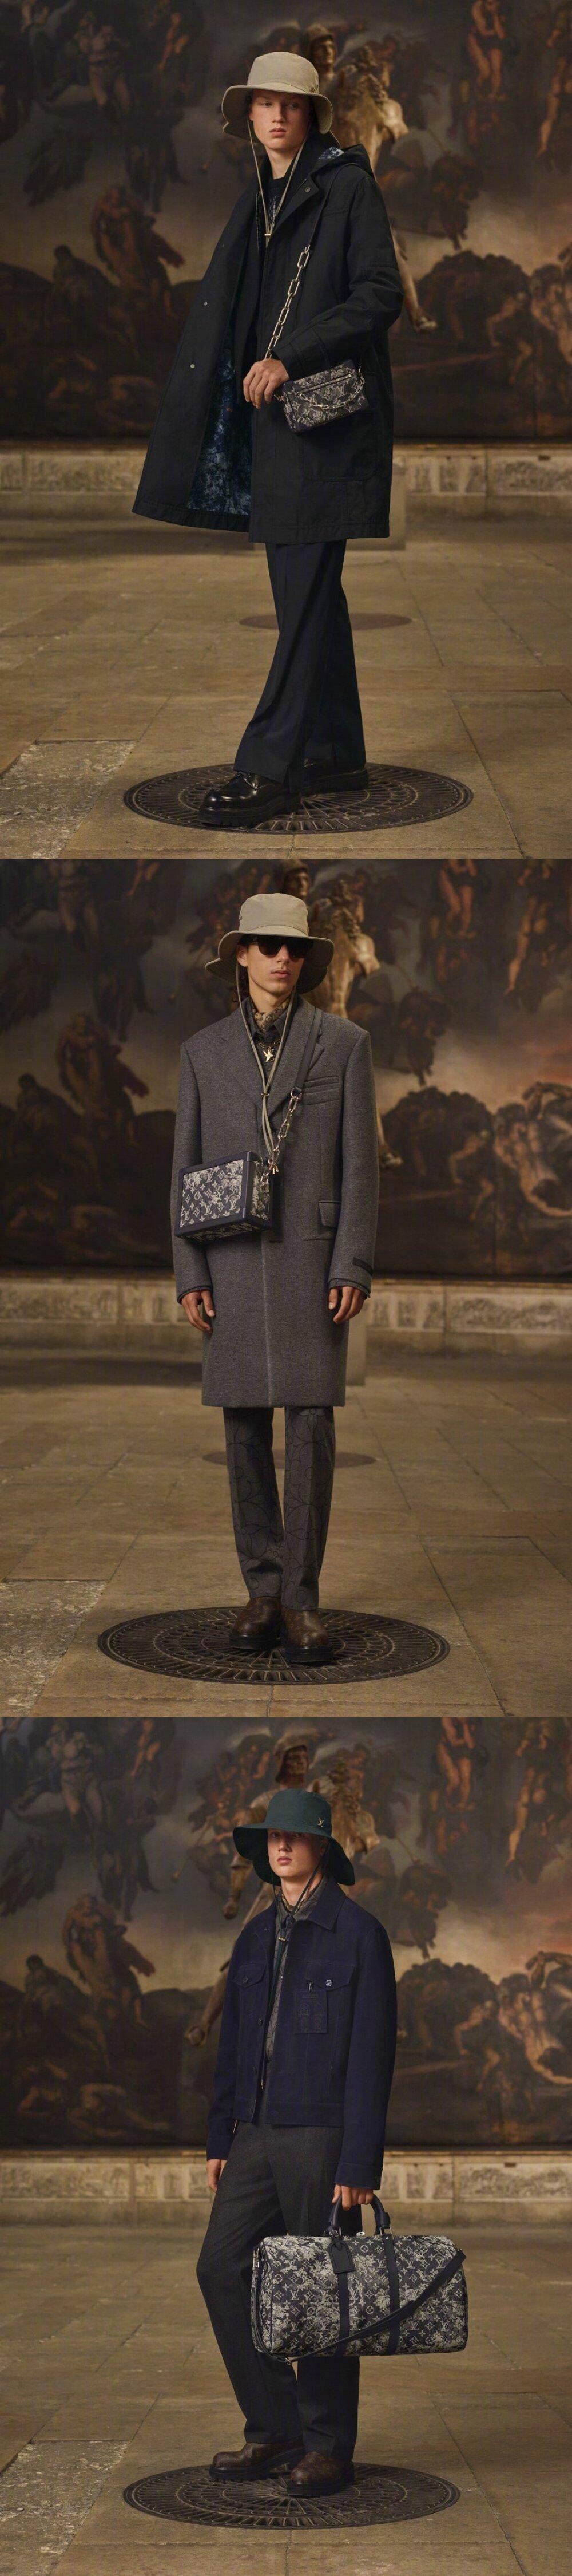 Louis Vuitton Menswear Resort 2021 早春男装系列|低调奢华的深色